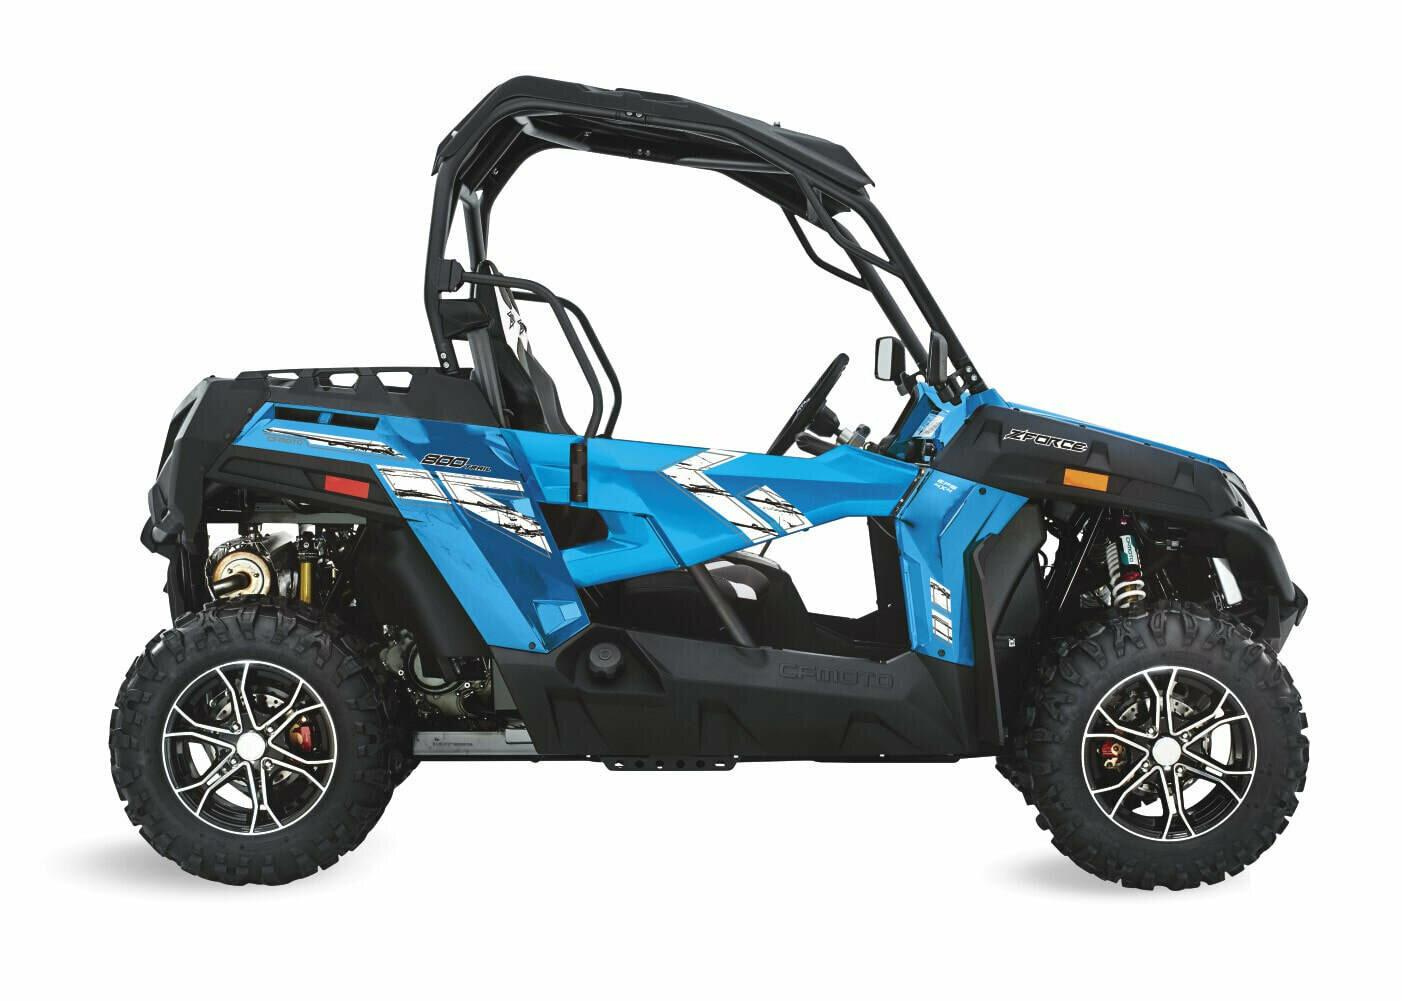 2019 CFMOTO ZFORCE 800 Trail EPS SSV 4x4 Blue